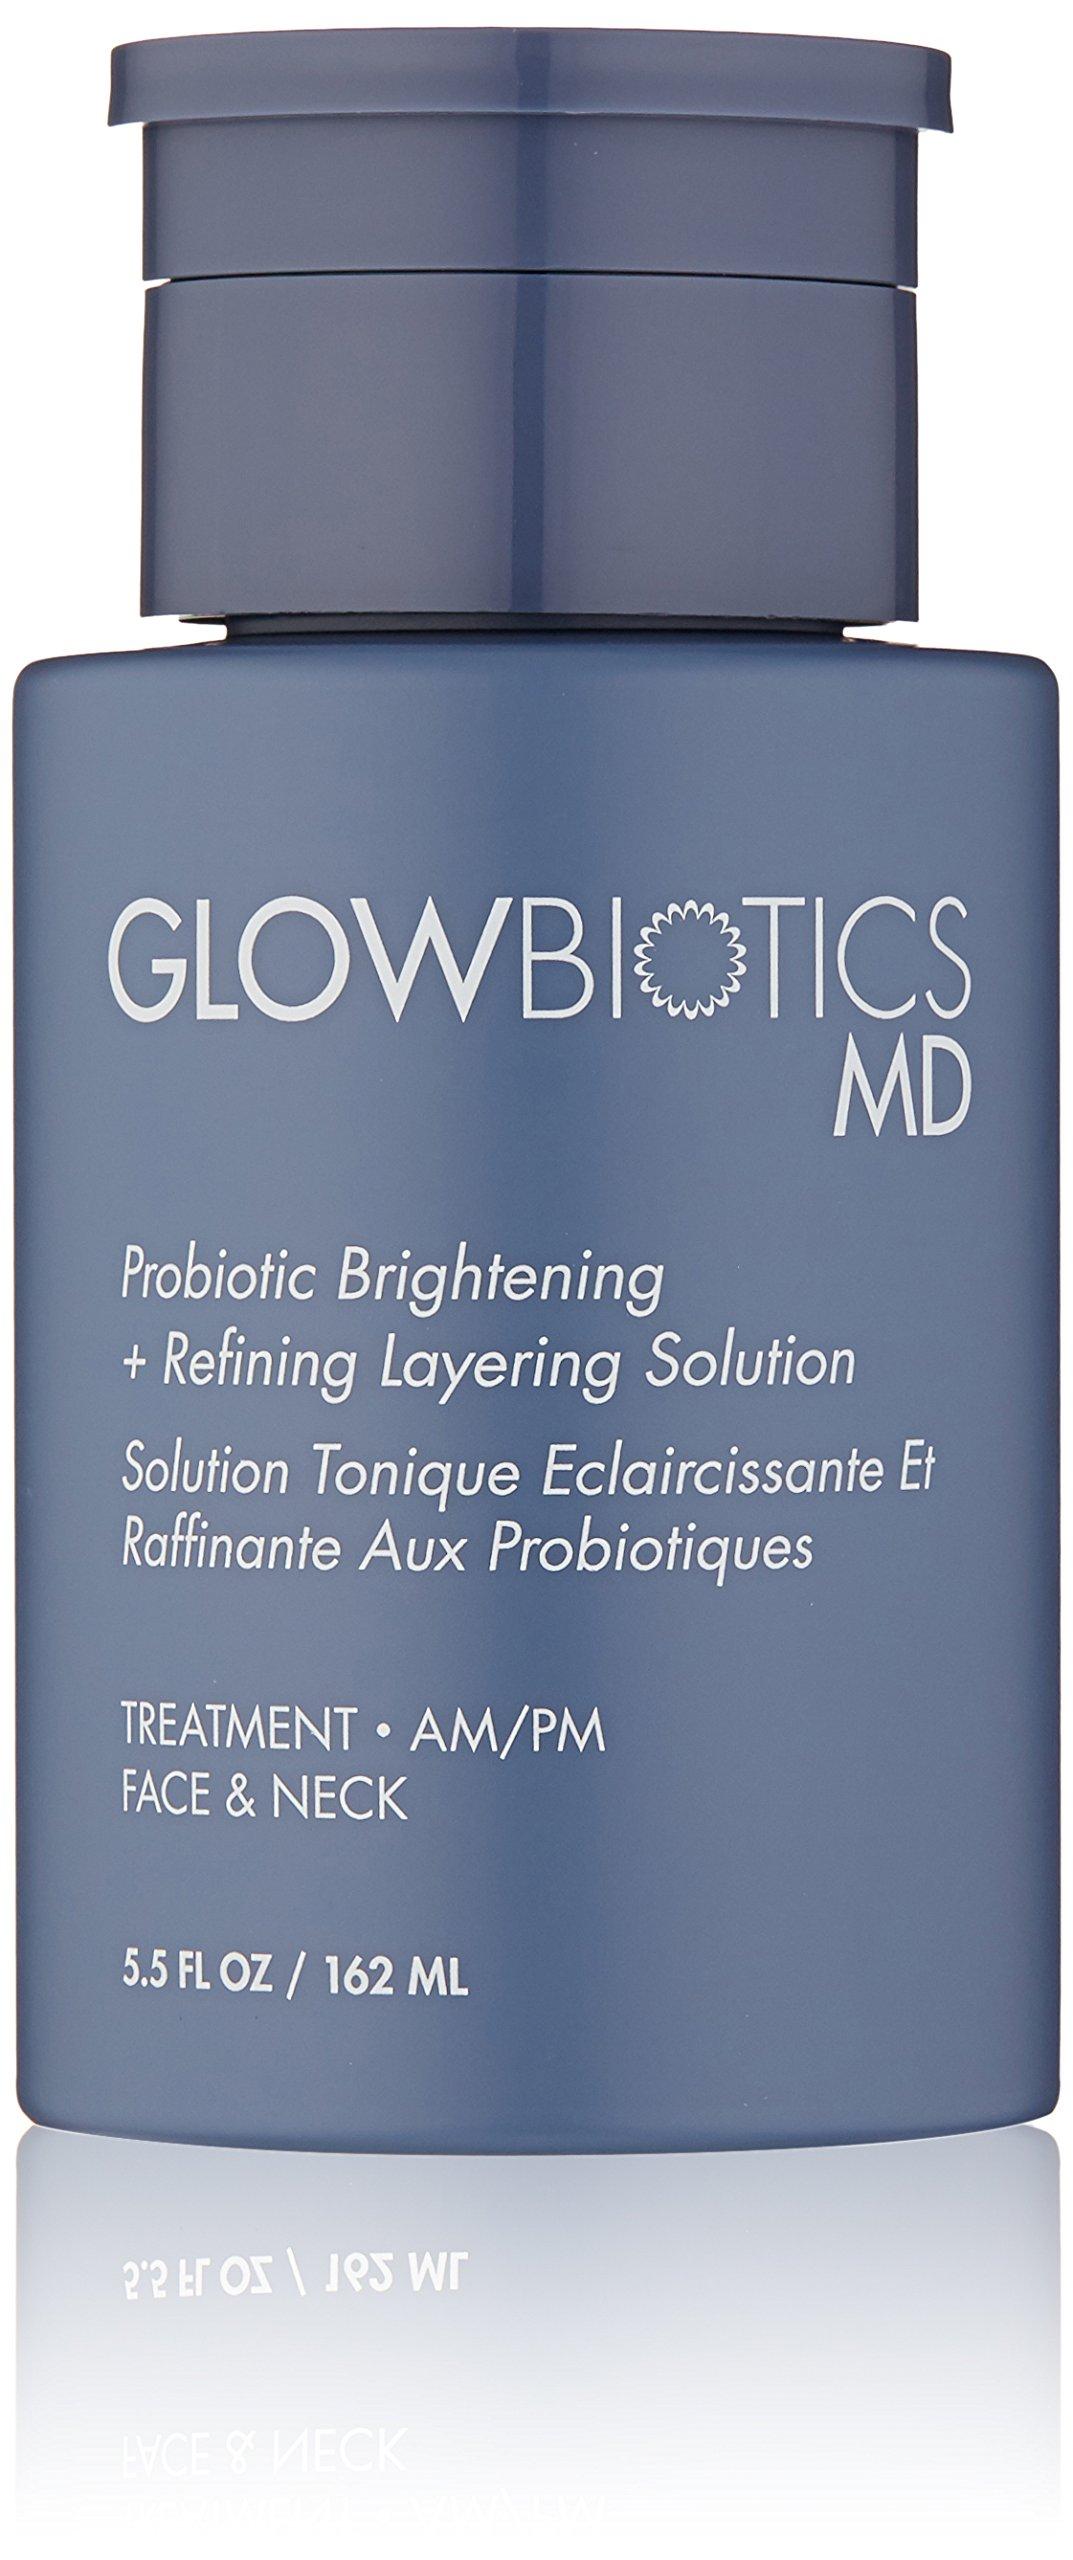 Glowbiotics MD Probiotic Brightening Refining